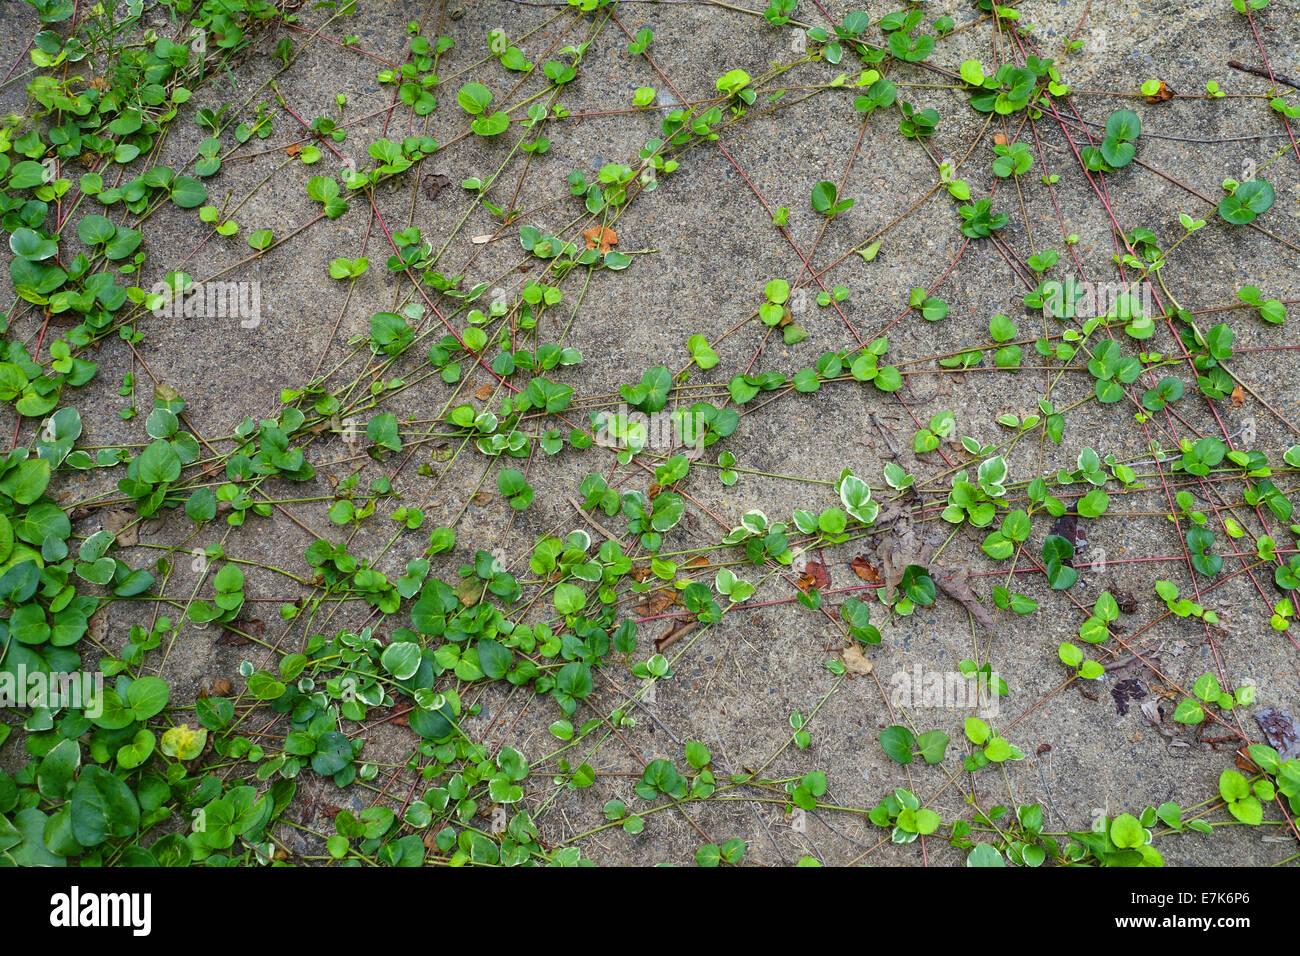 Invasive Vines Growing On Concrete Wall Stock Photo